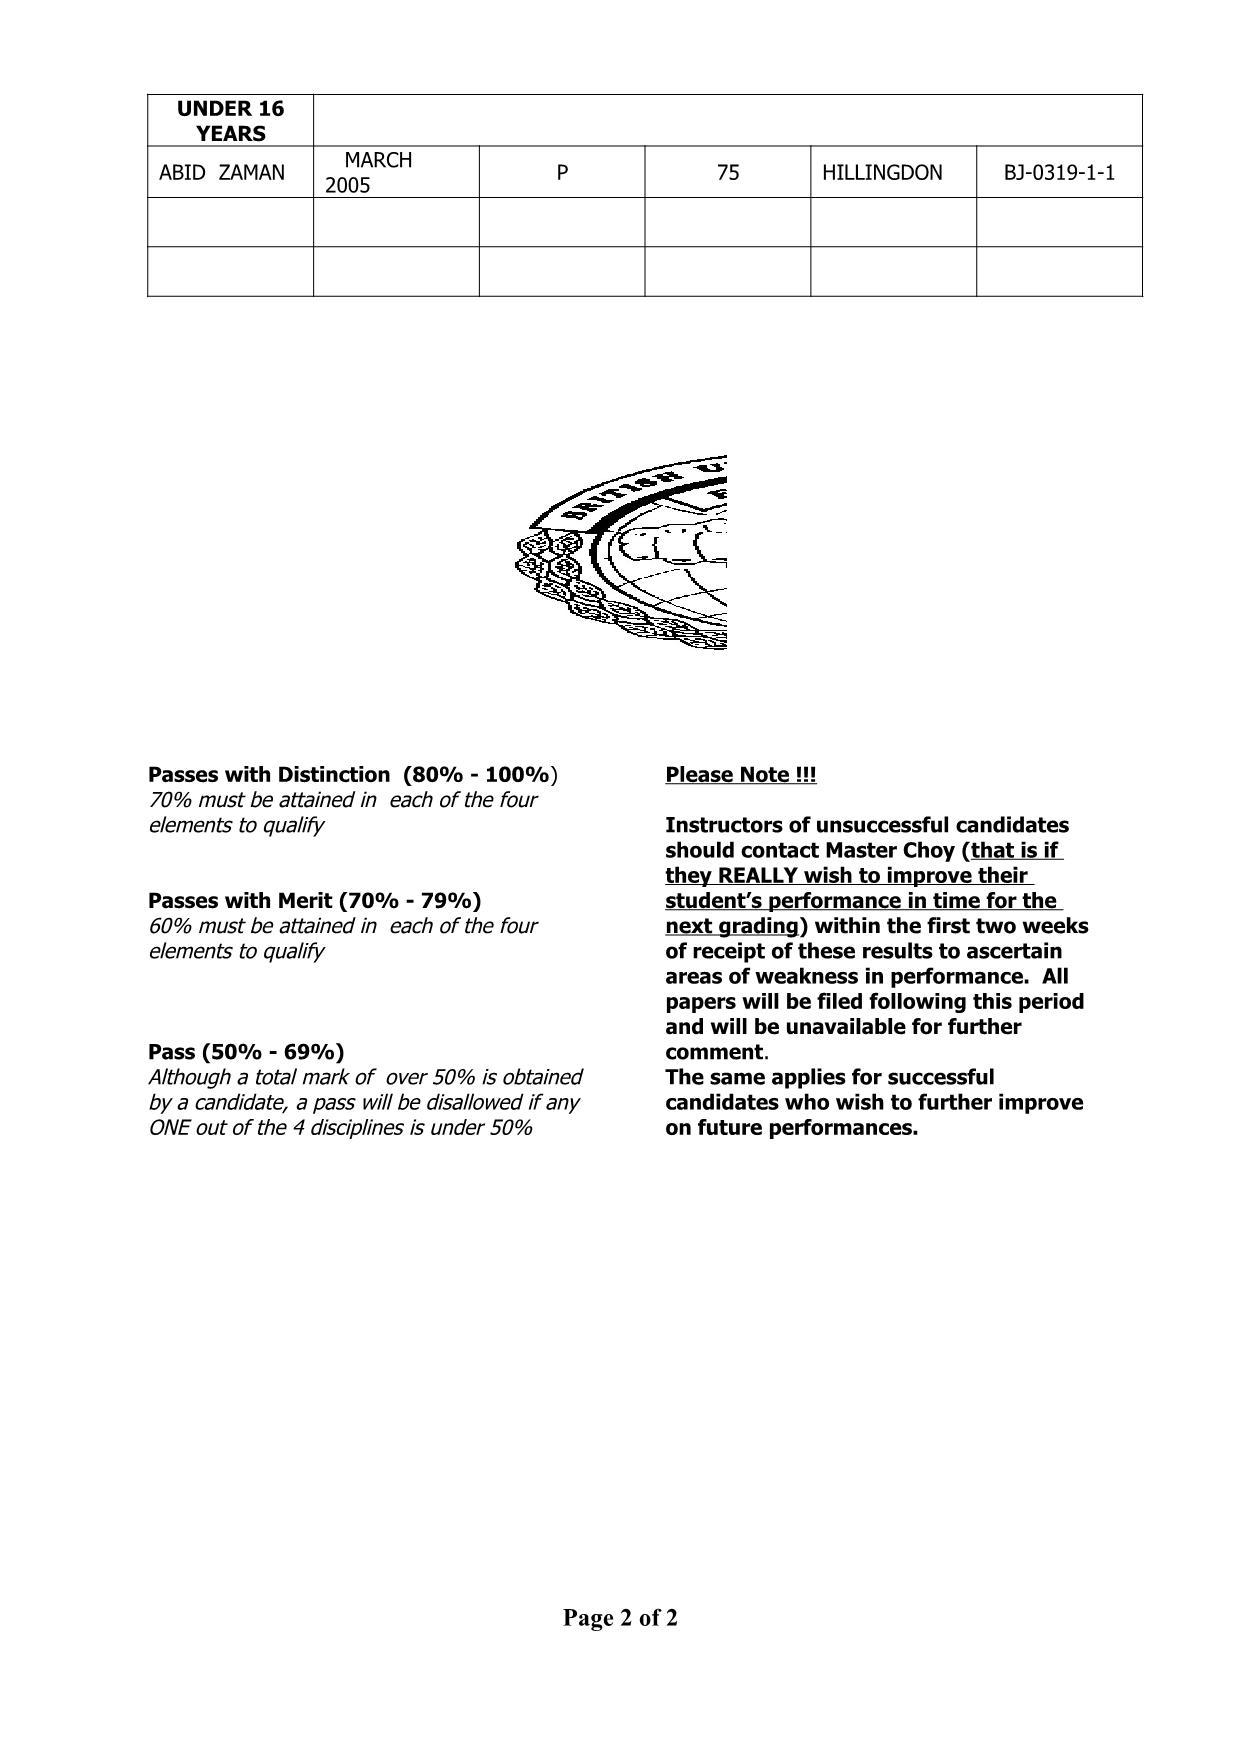 RESULTS B.B.Grading 03-19  (1)_2.jpg